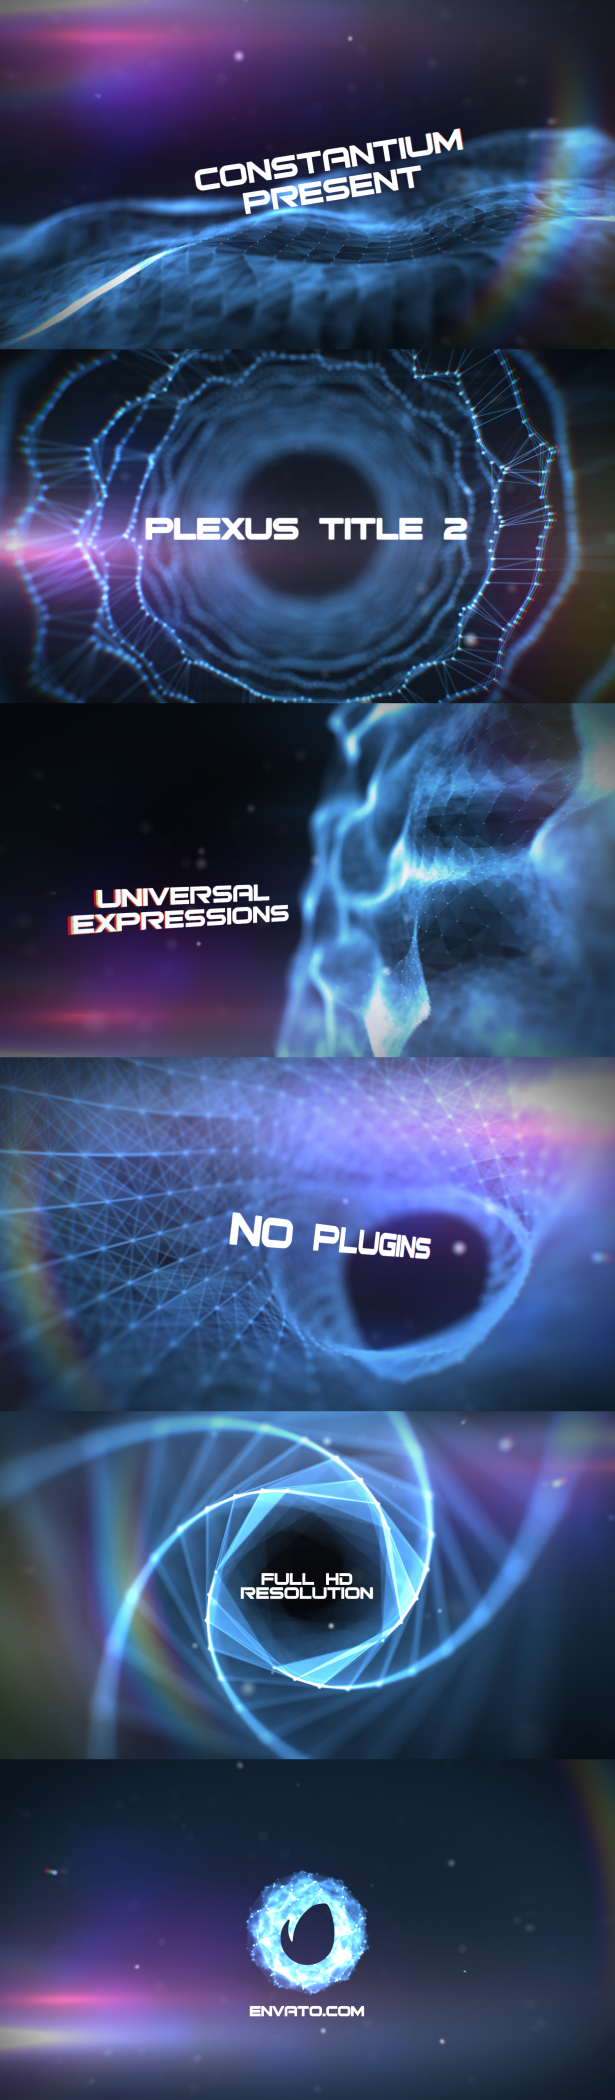 Plexus Title 2 - 1